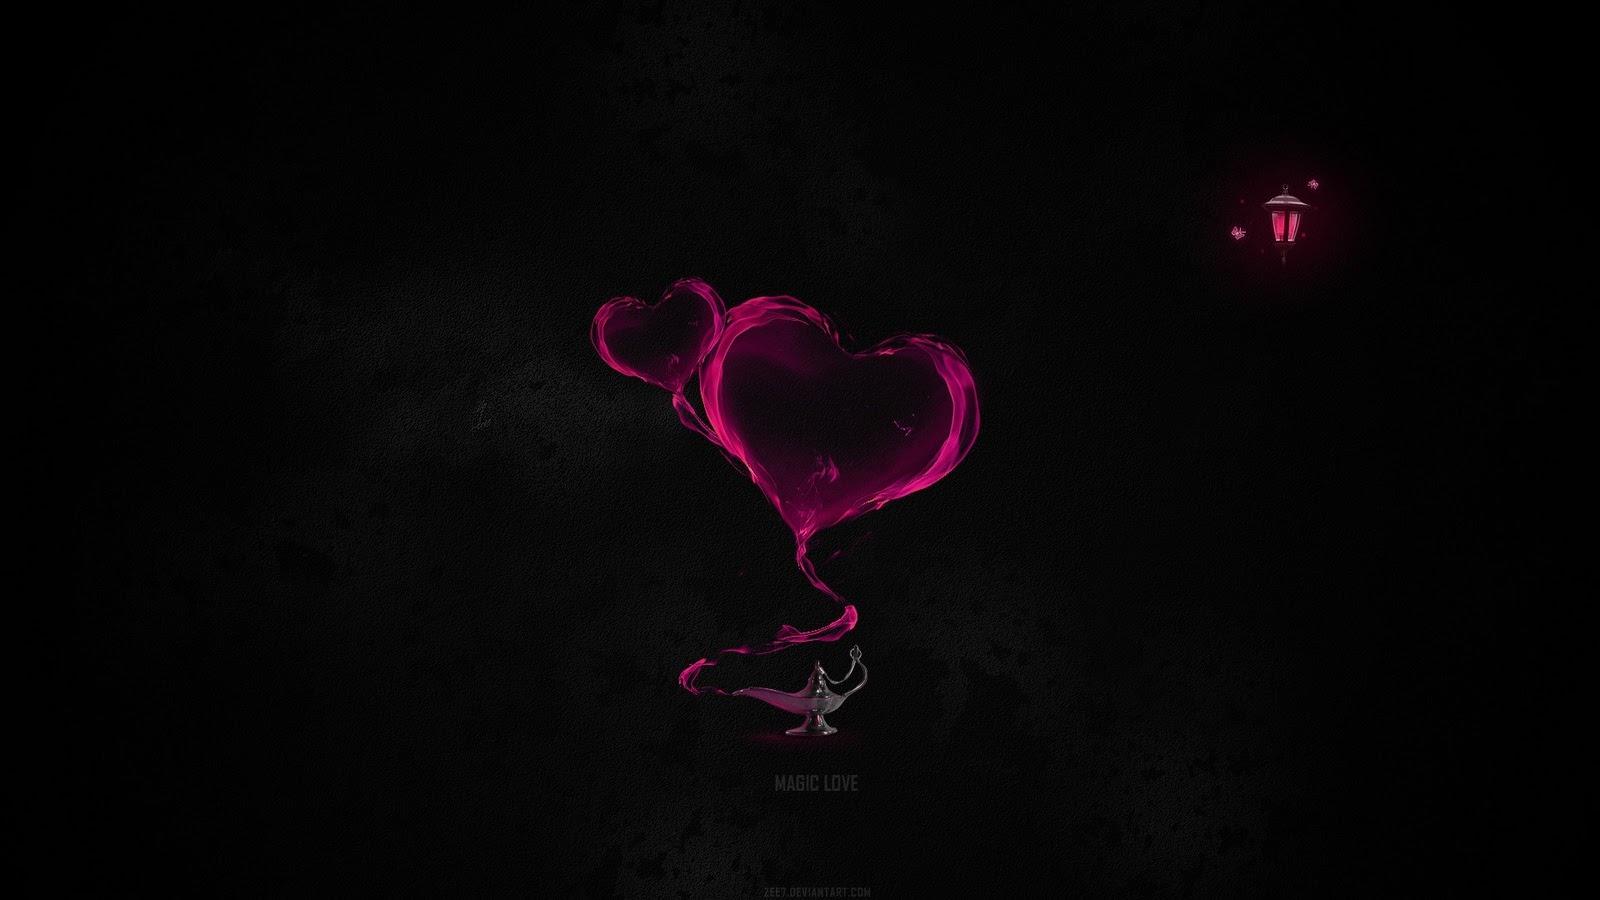 Love Desktop Wallpaper Full Hd: Free 3D Wallpapers Download: Love Hd Wallpaper, Love